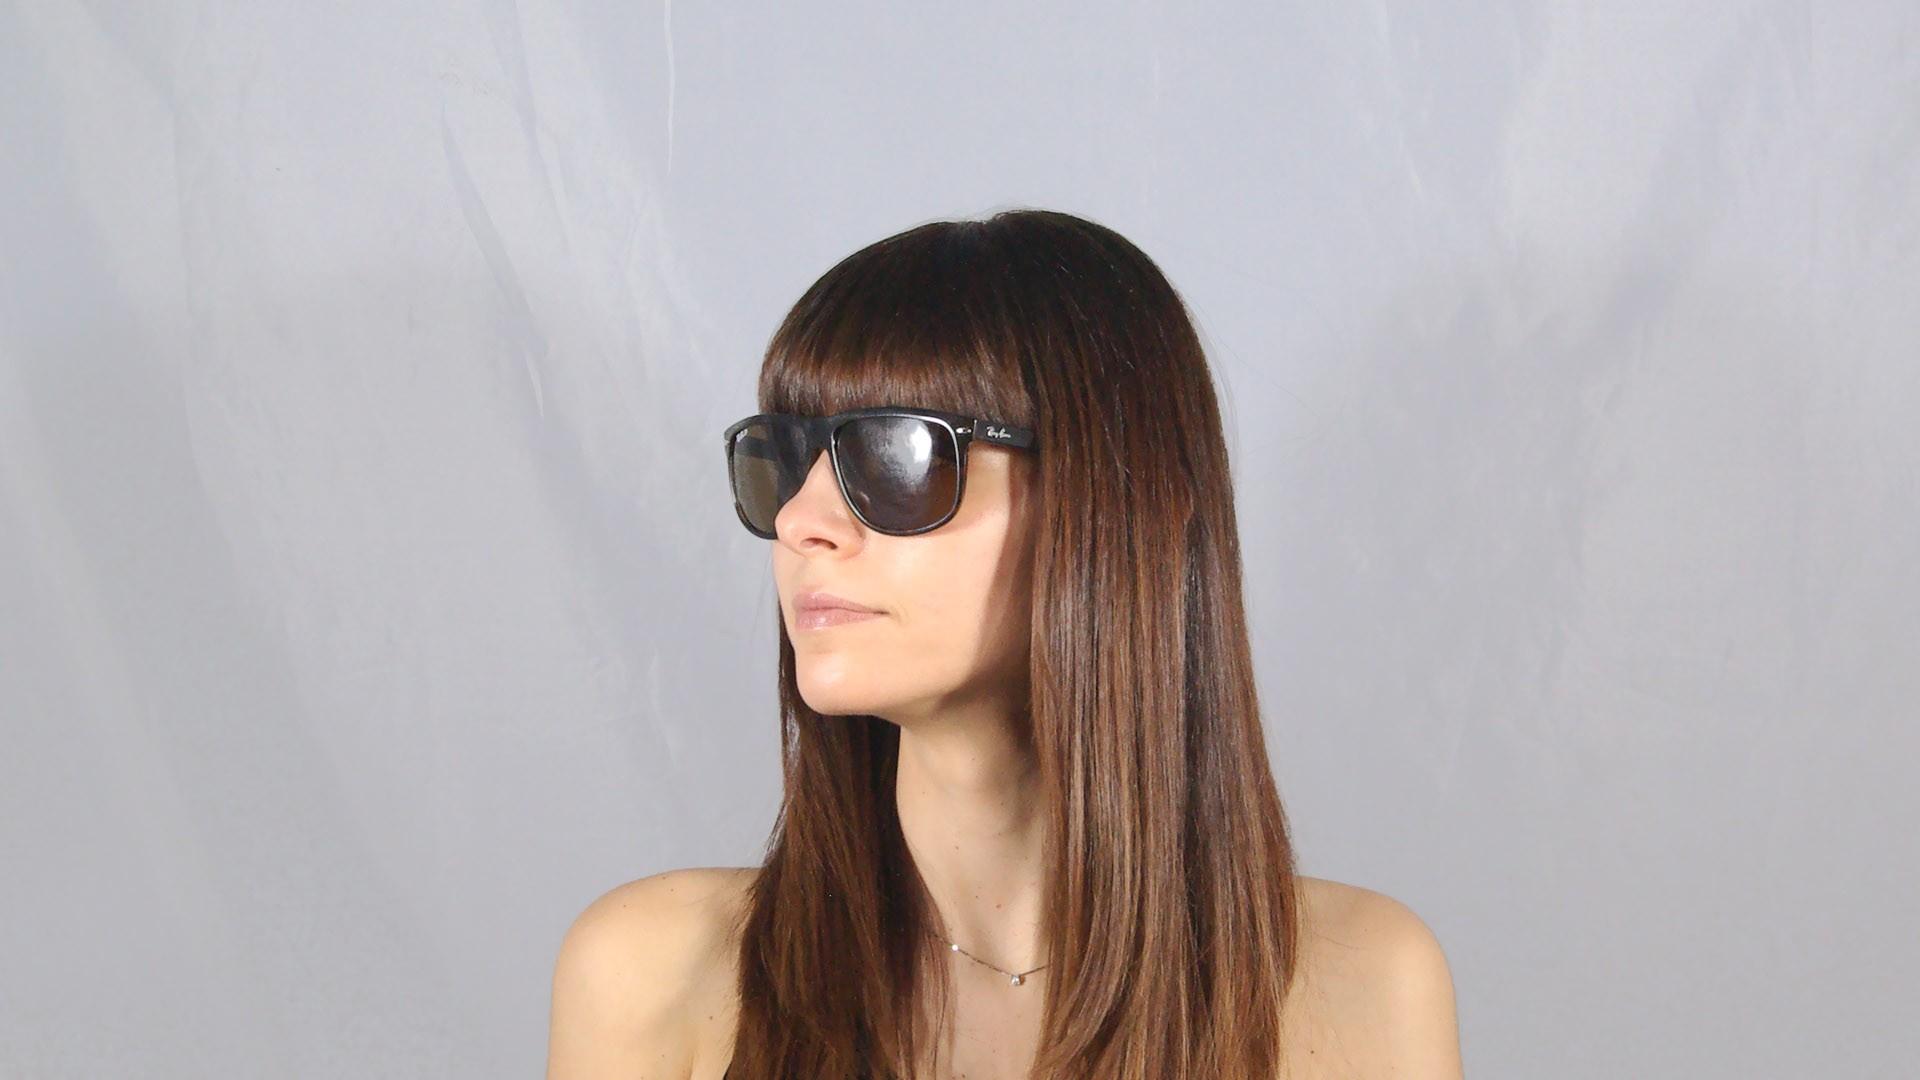 58ad386ed74 Sunglasses Ray-Ban RB4147 710 57 60-15 Tortoise Large Polarized